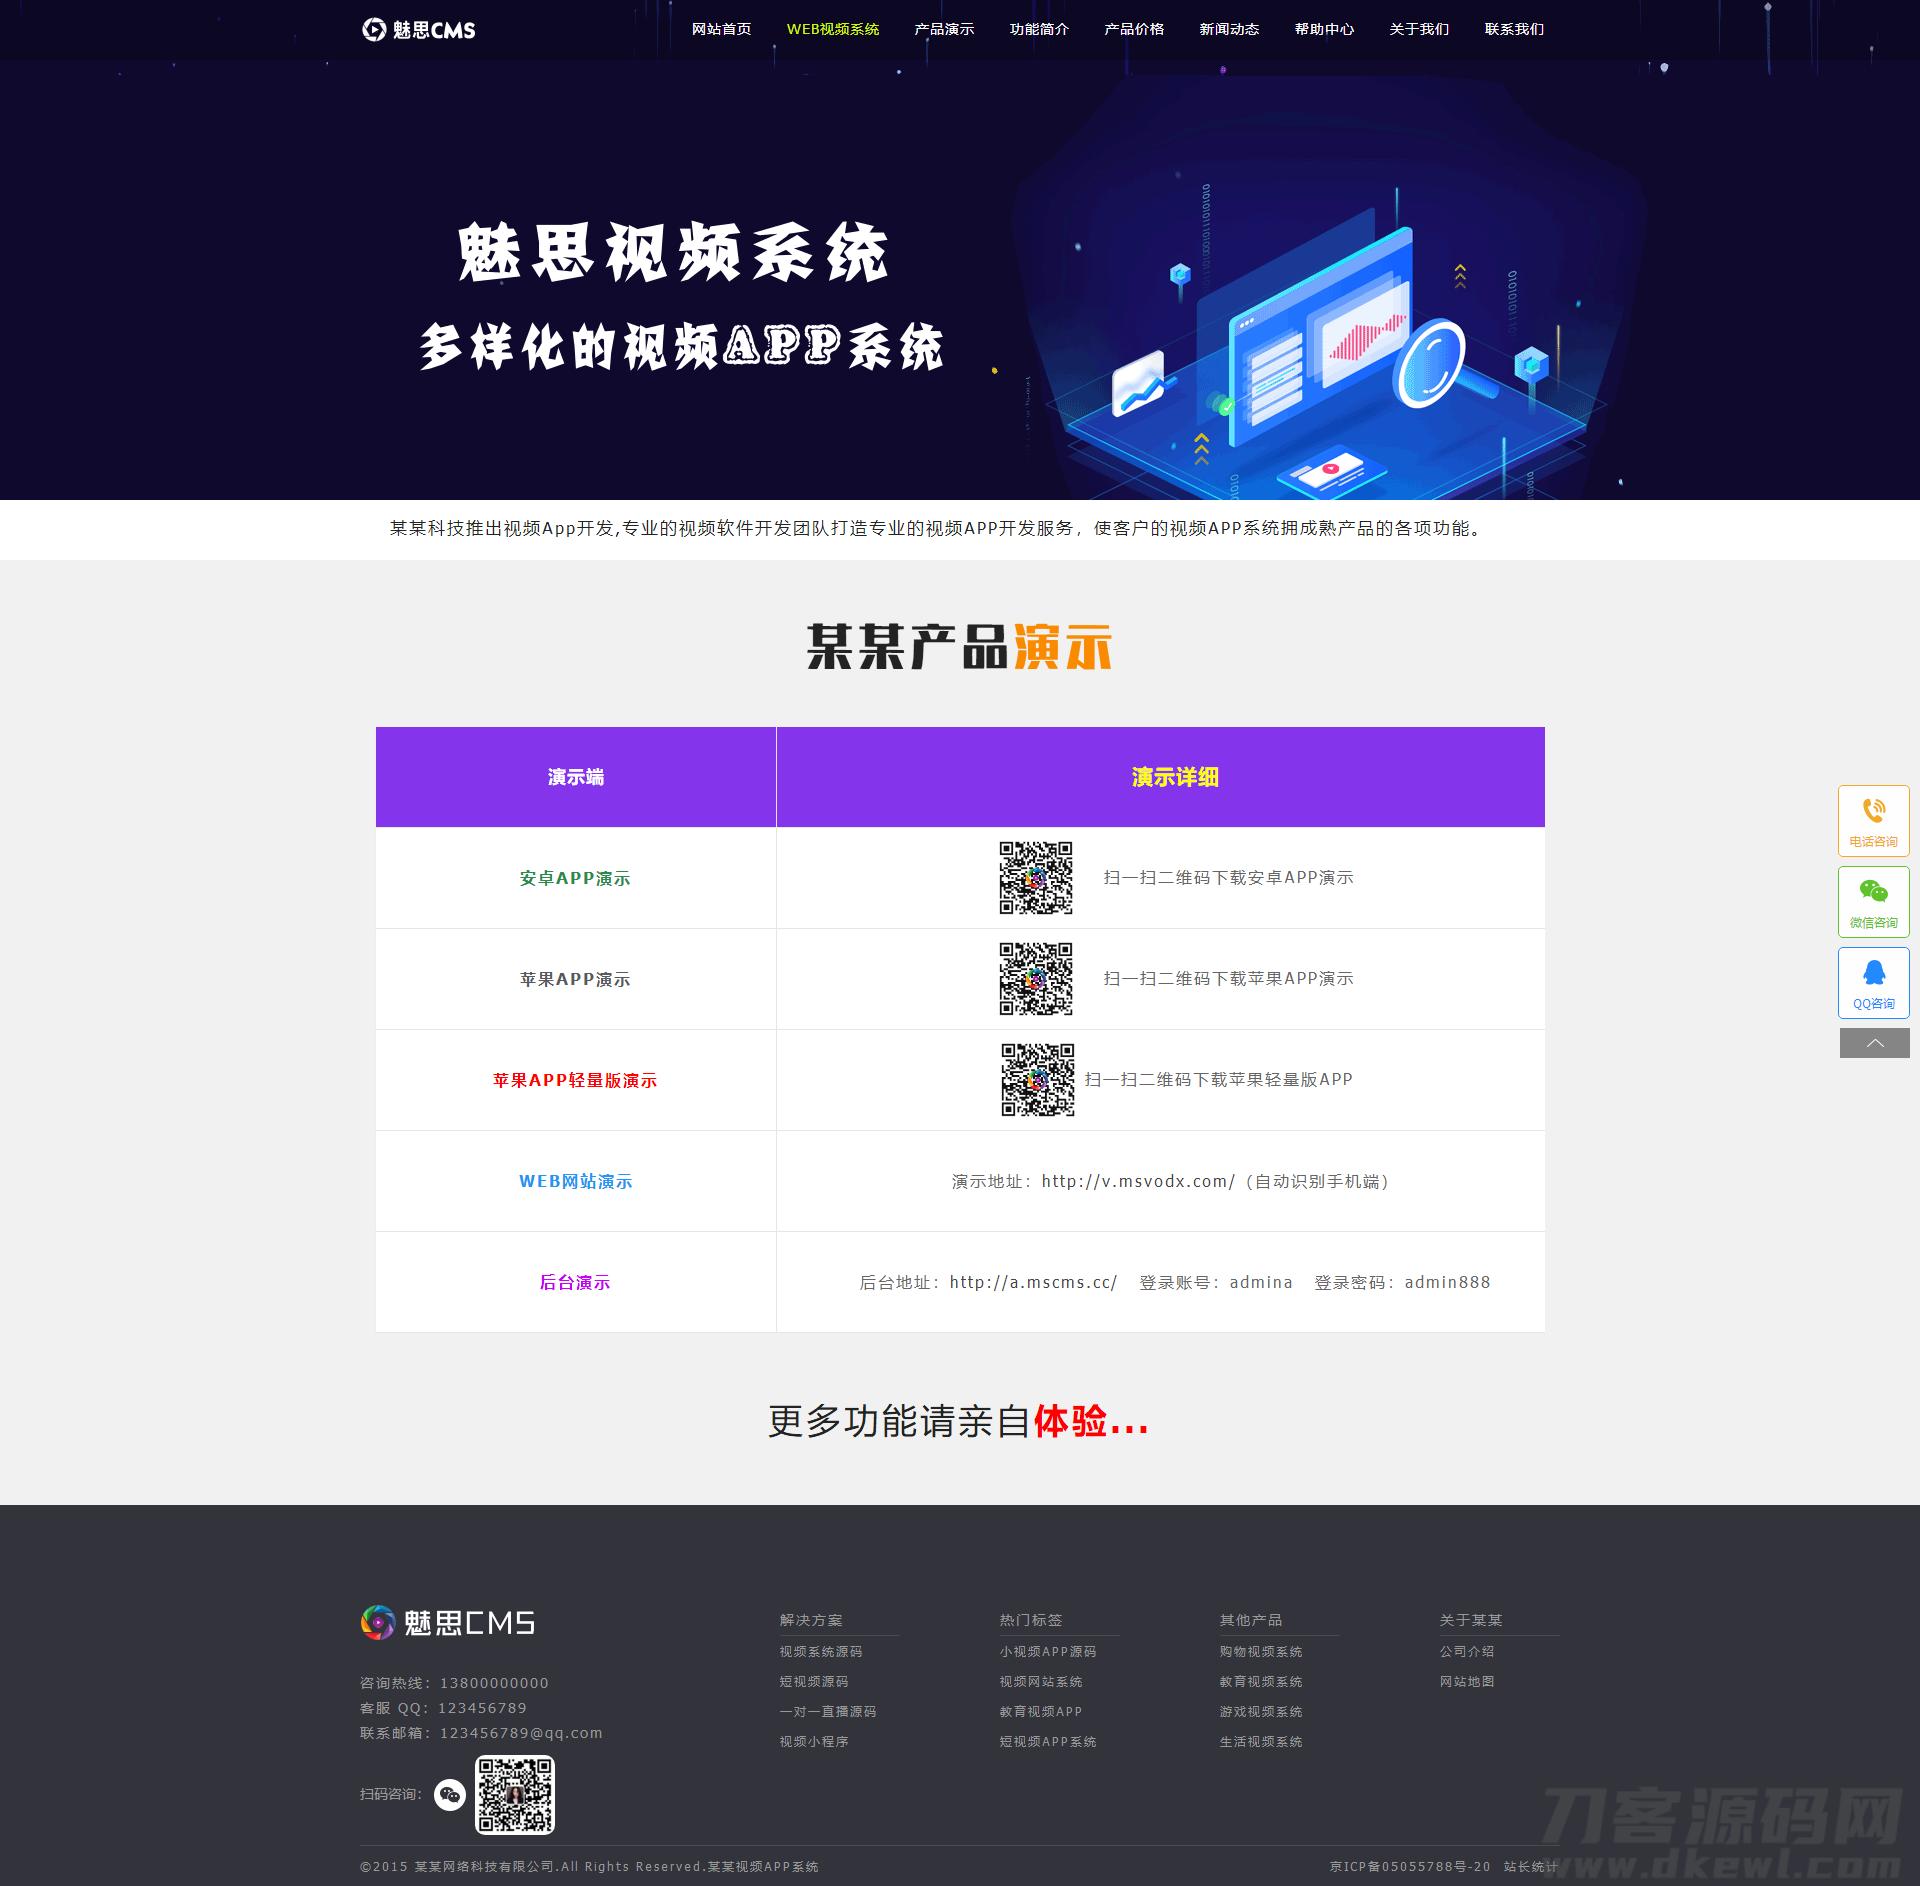 yzmcms仿制魅思视频软件官网_带后台插图1